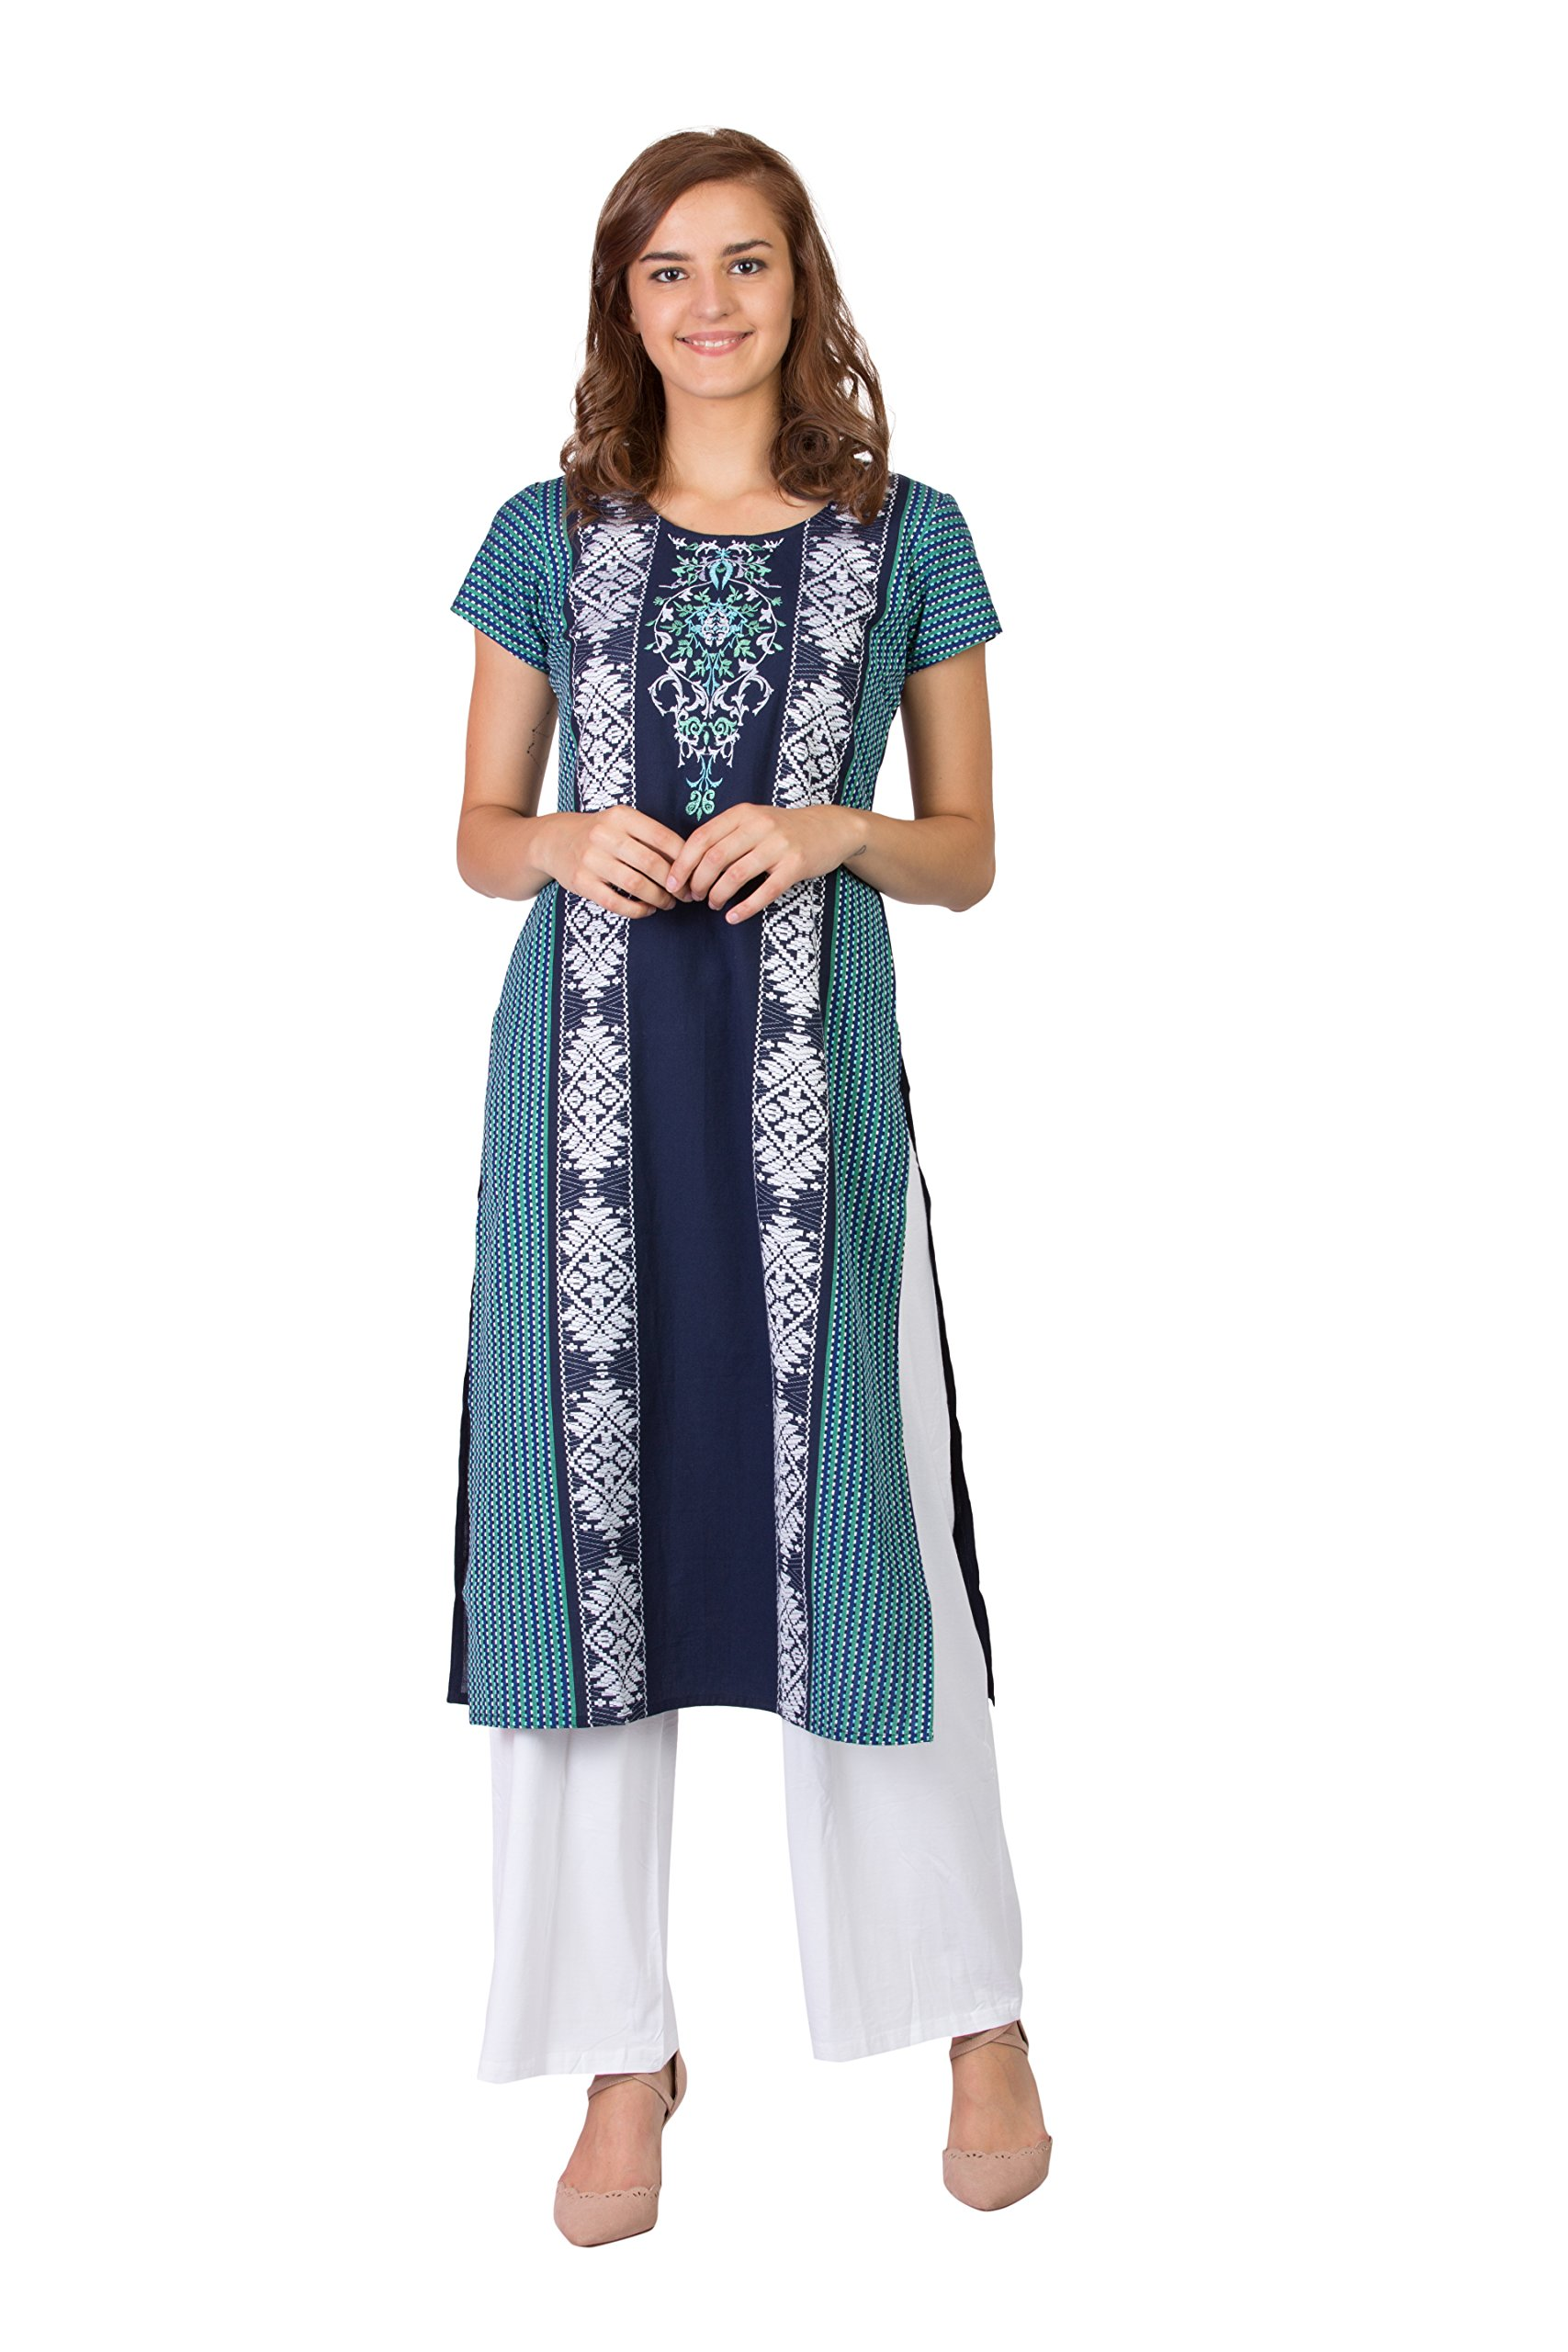 SABHYATA Women Kurta Designer Ethnic Long Dress Casual Tunic Kurti for Women Ladies Partywear Material 100% Pure Cotton Neck Type Round Neck Medium N.Blue